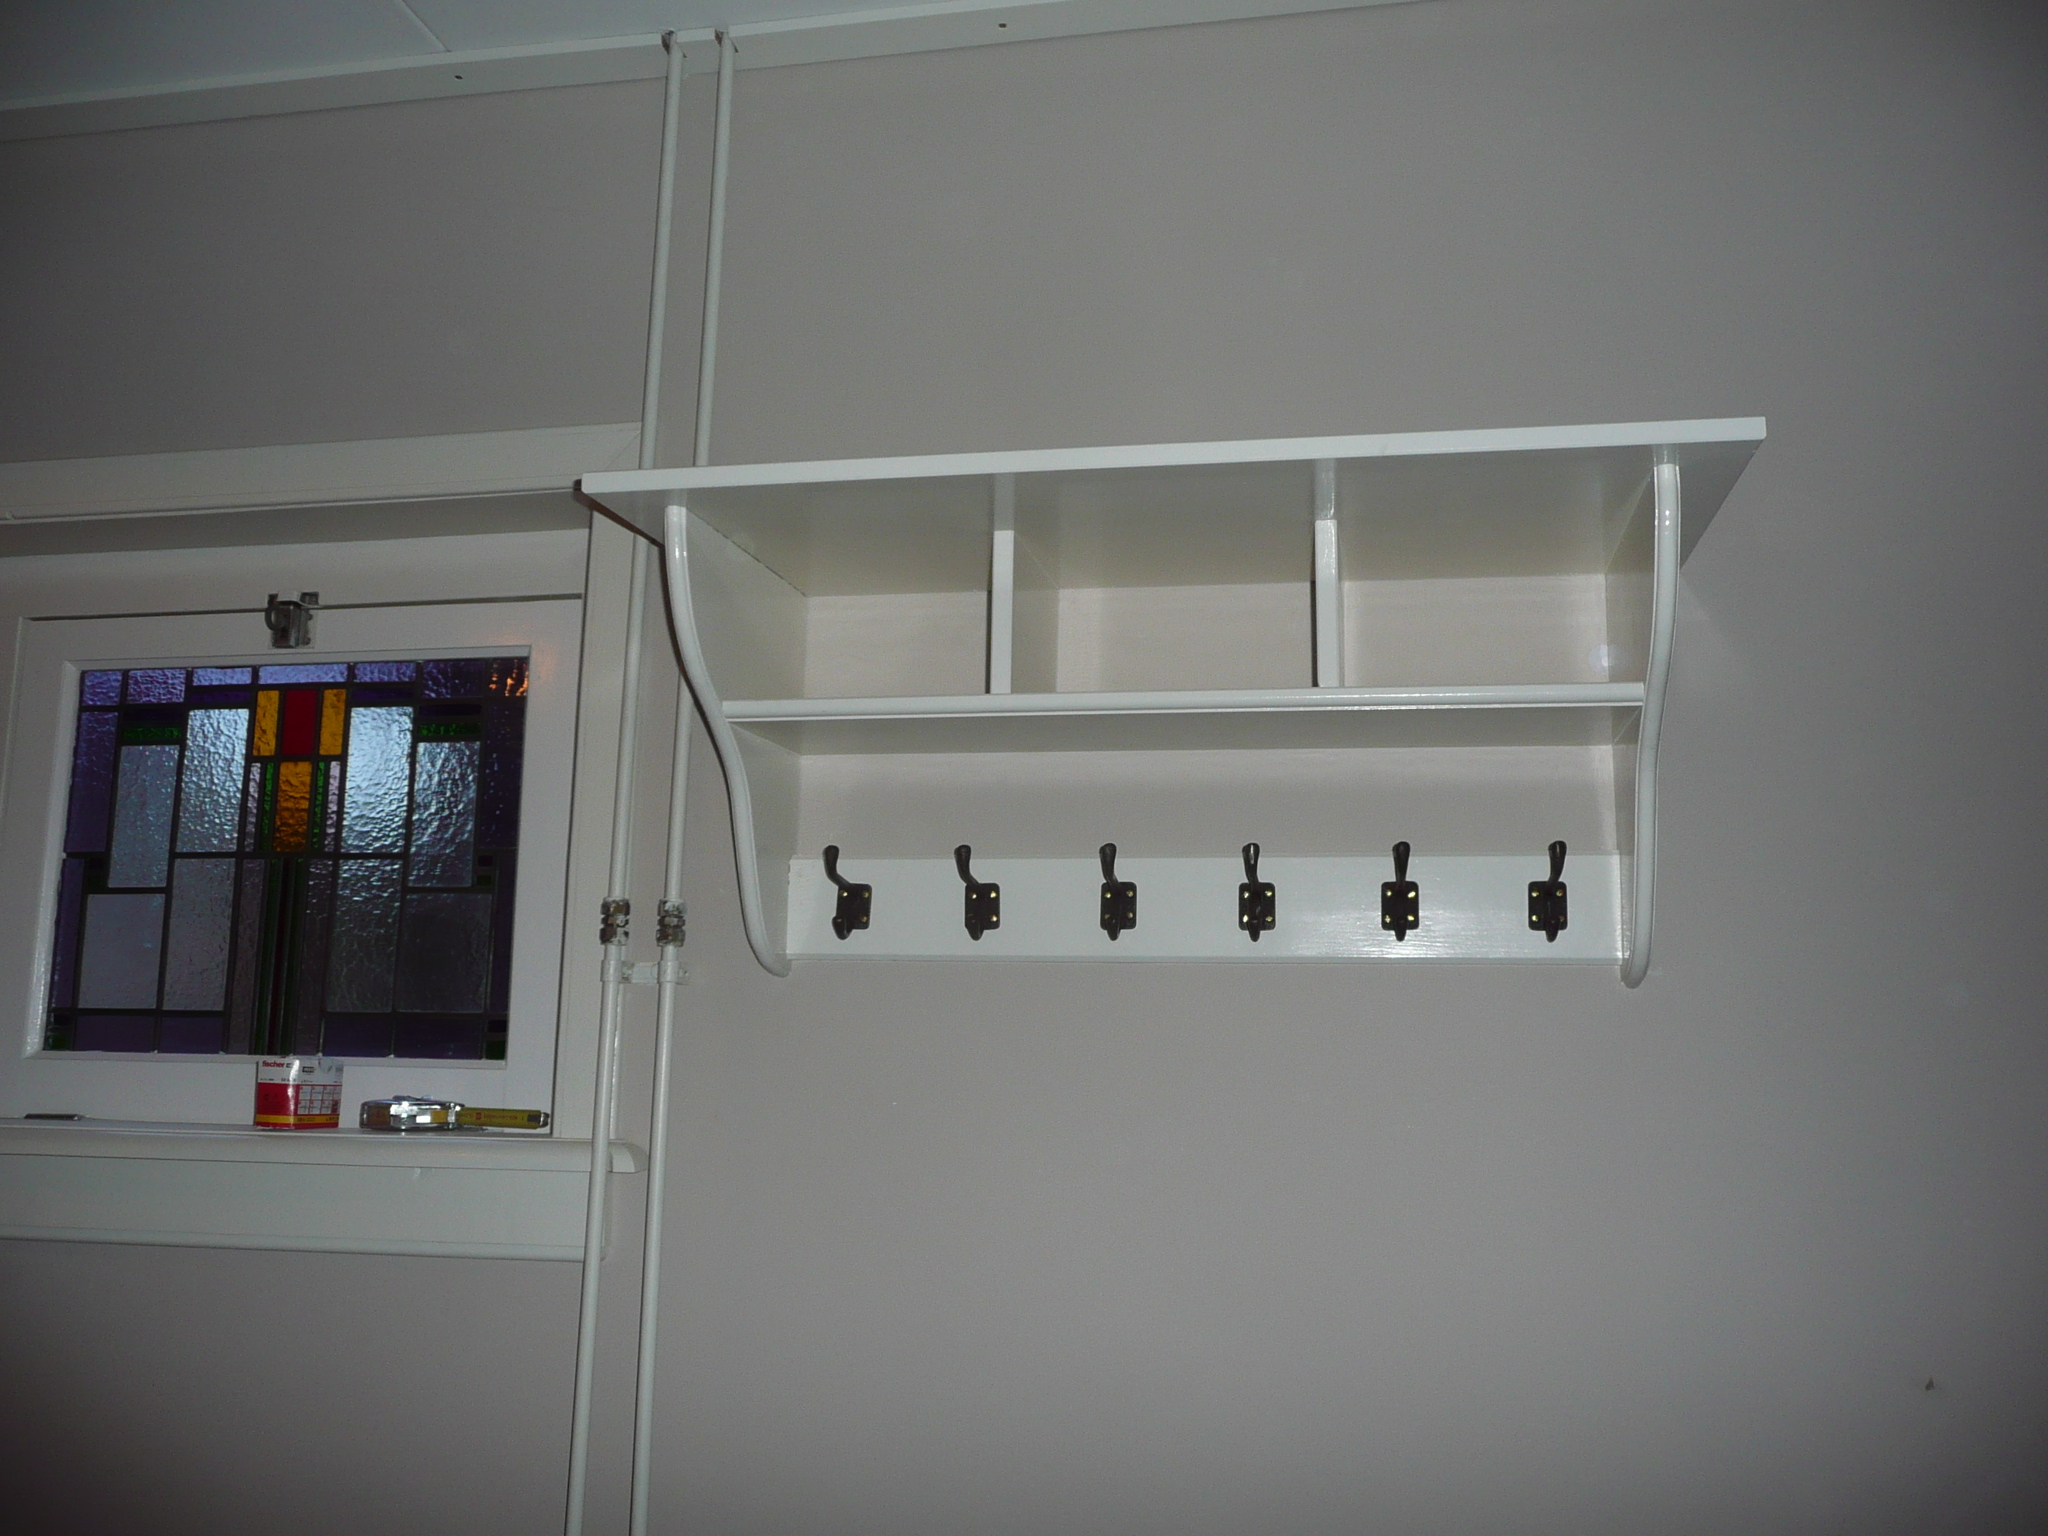 Wandkraan keuken praxis praxis keukens great badkamer radiator hu